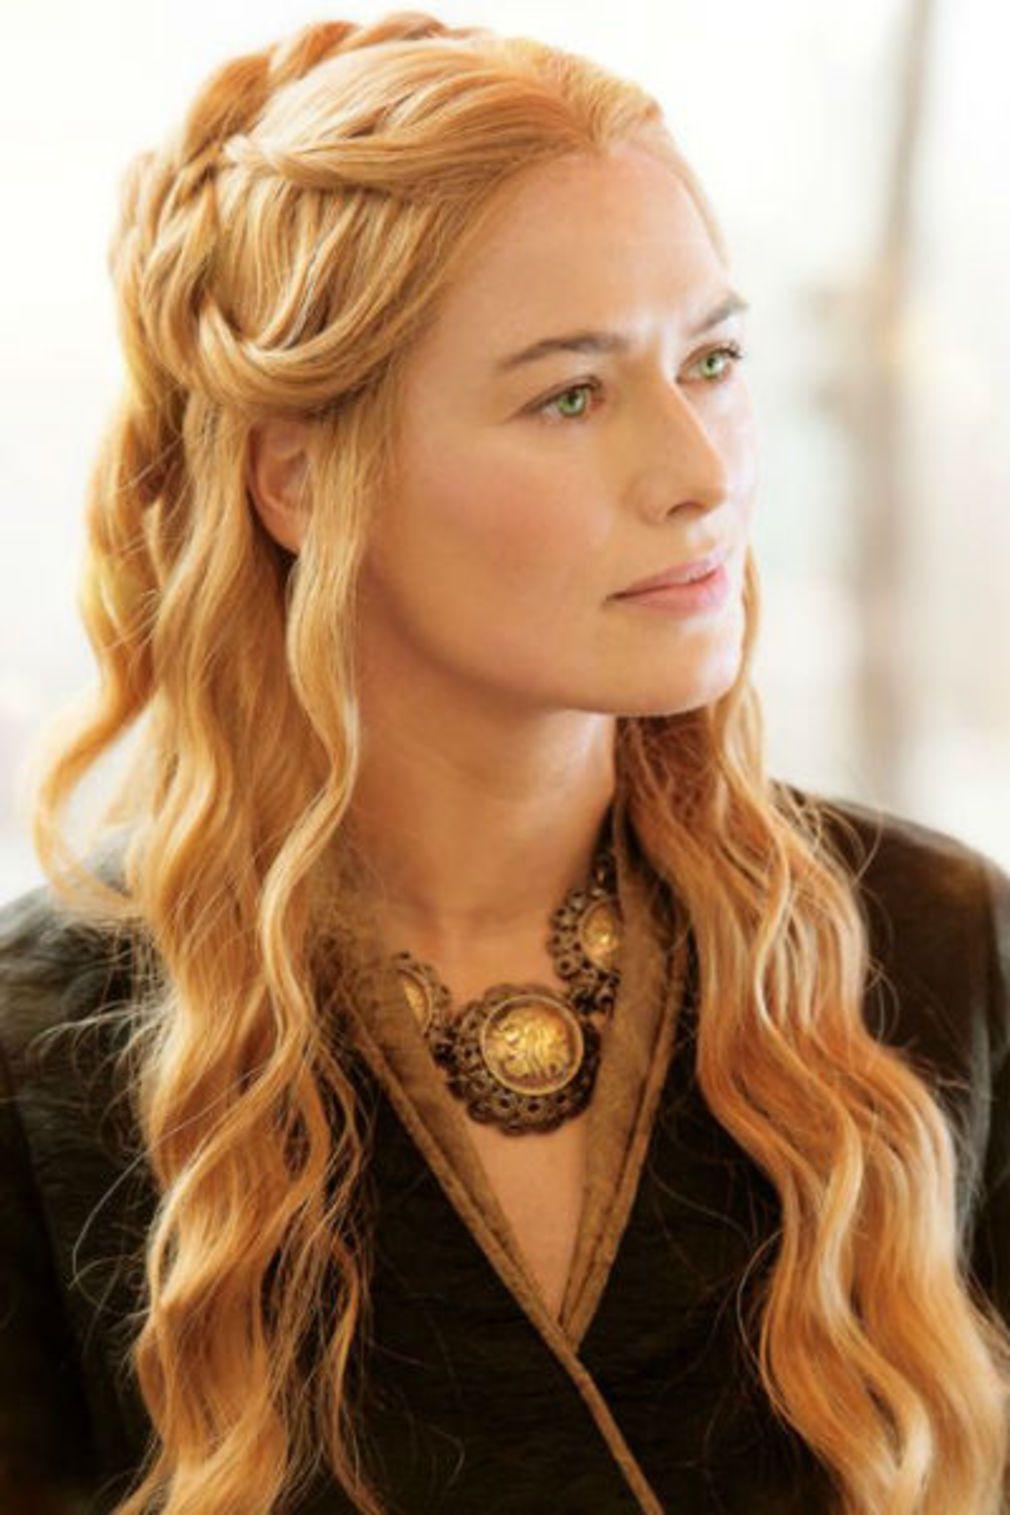 Coiffure romantique Cersei Lannister Belle coiffure